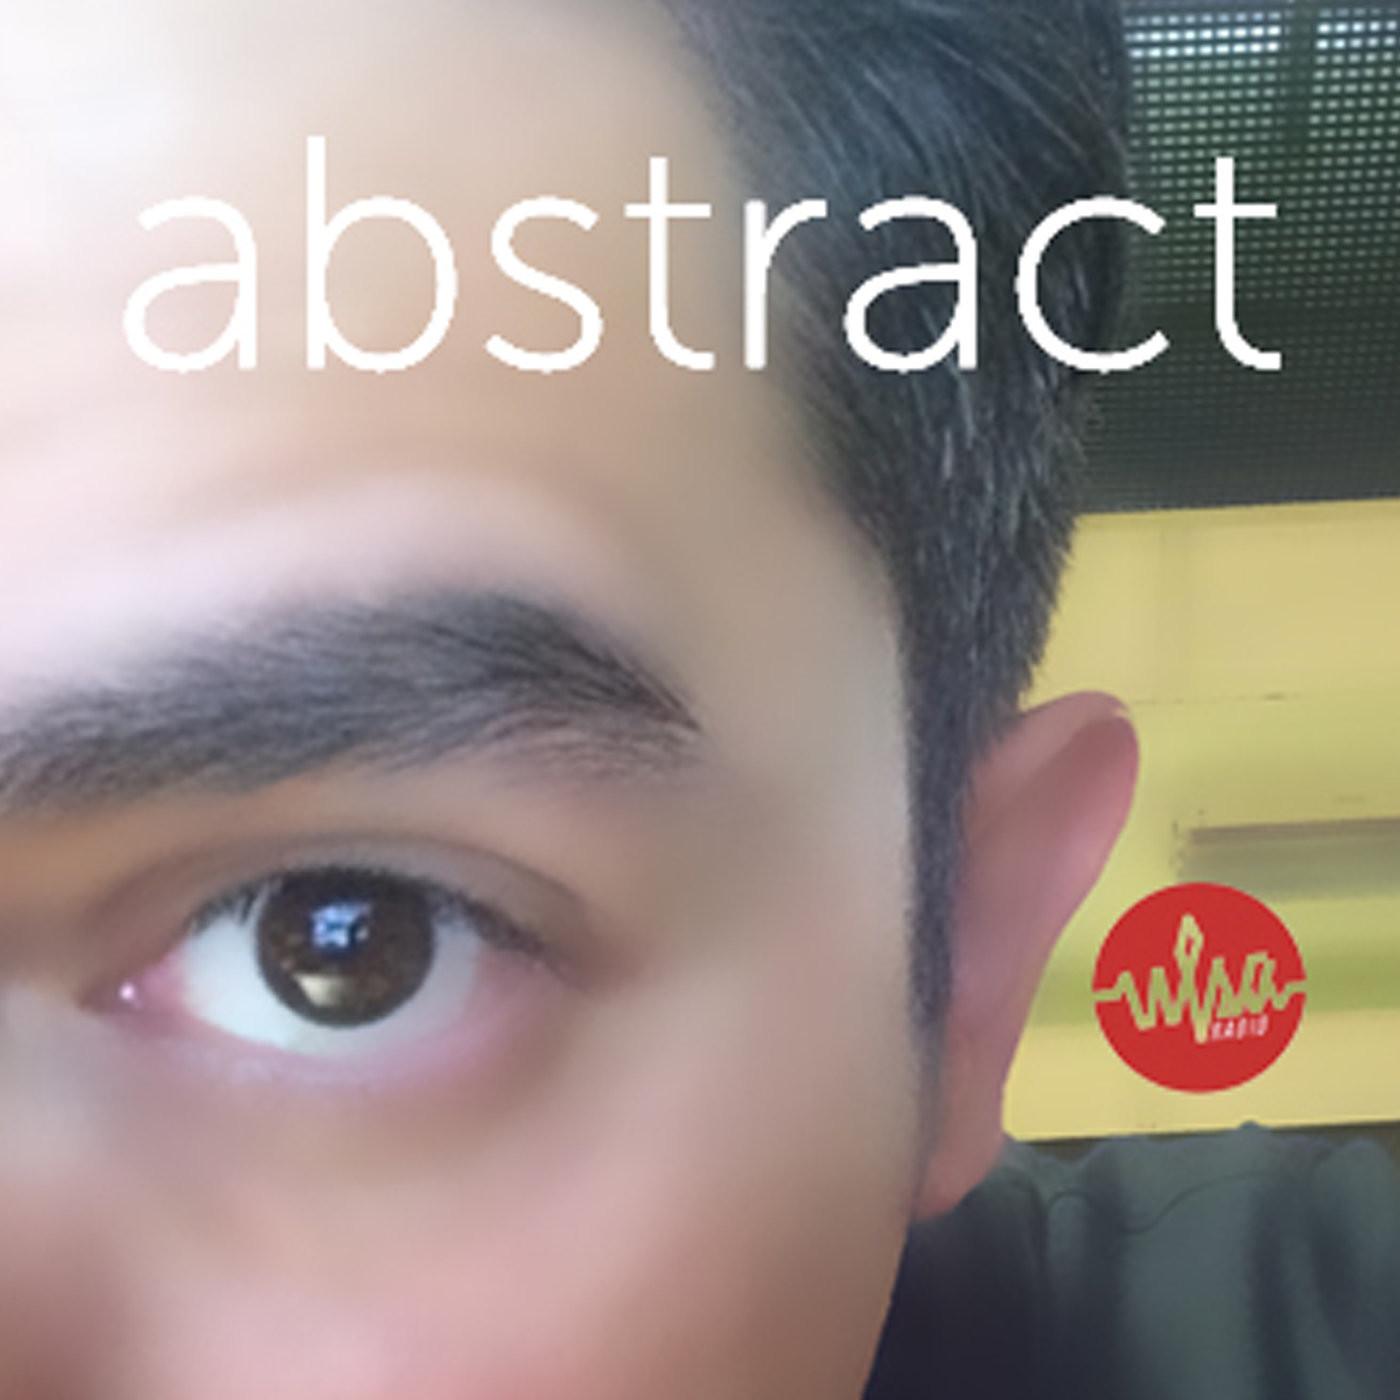 <![CDATA[Abstract]]>